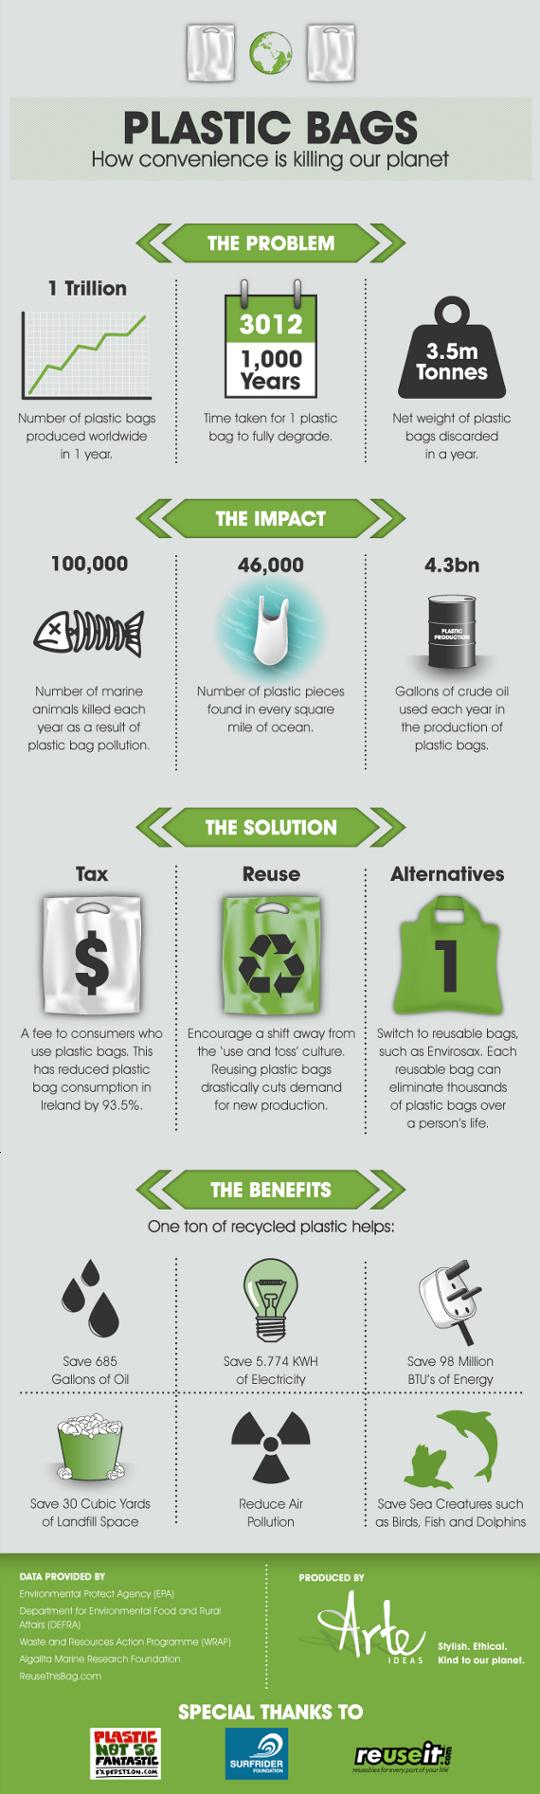 Plastic Kills Oceans-Infographic